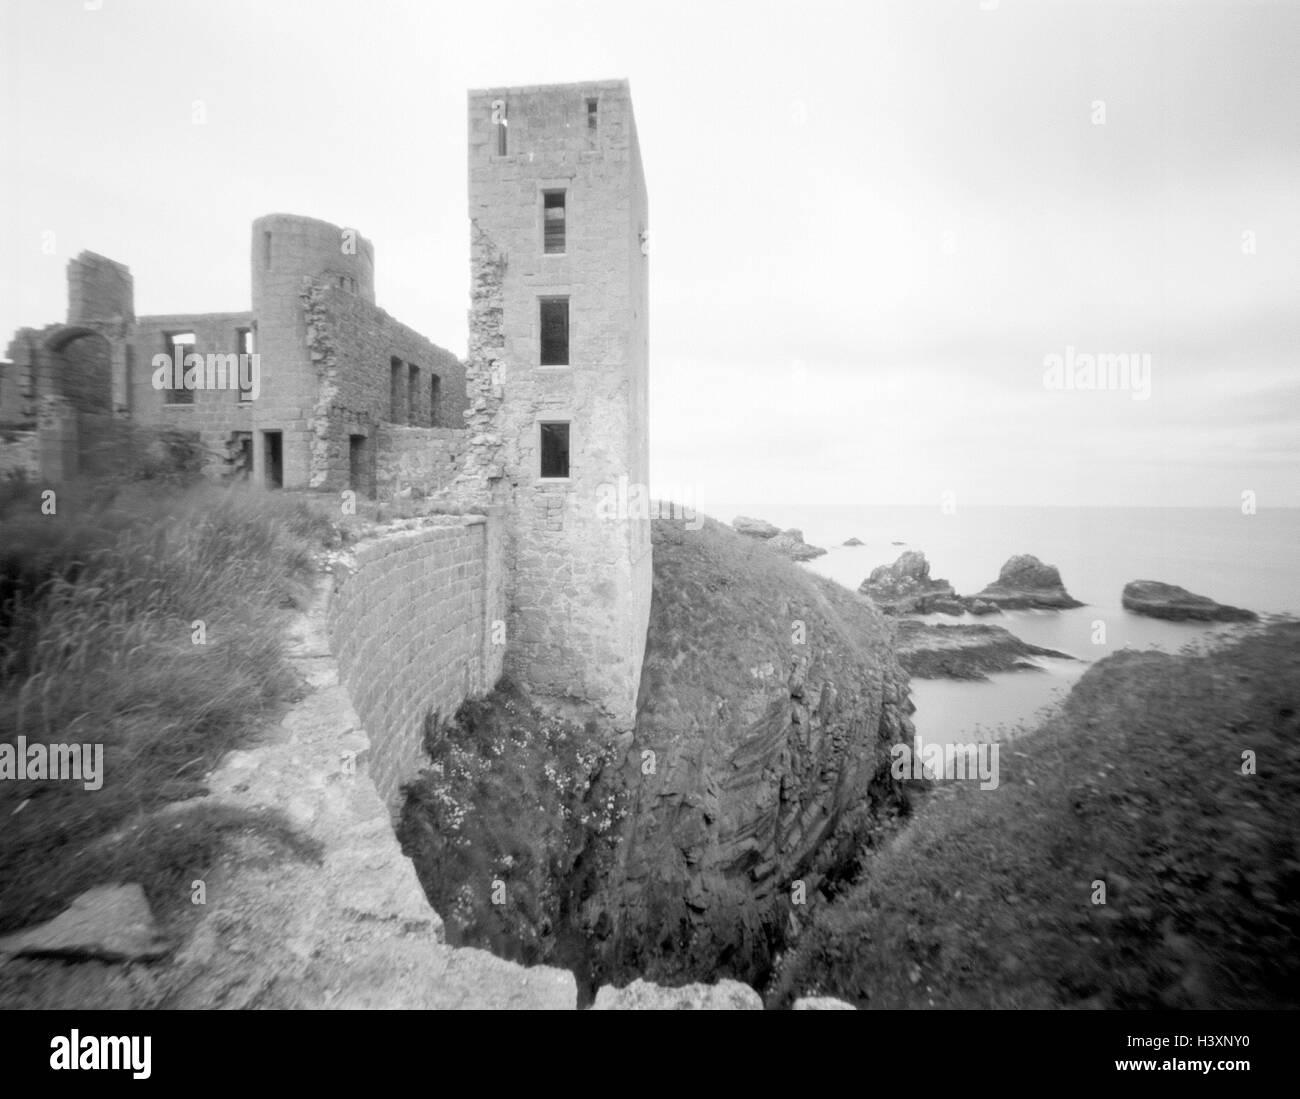 Great Britain, Scotland, coast, Slains Castle, b/w, west coast, scenery, castle, fortress, castle ruin, structure, - Stock Image